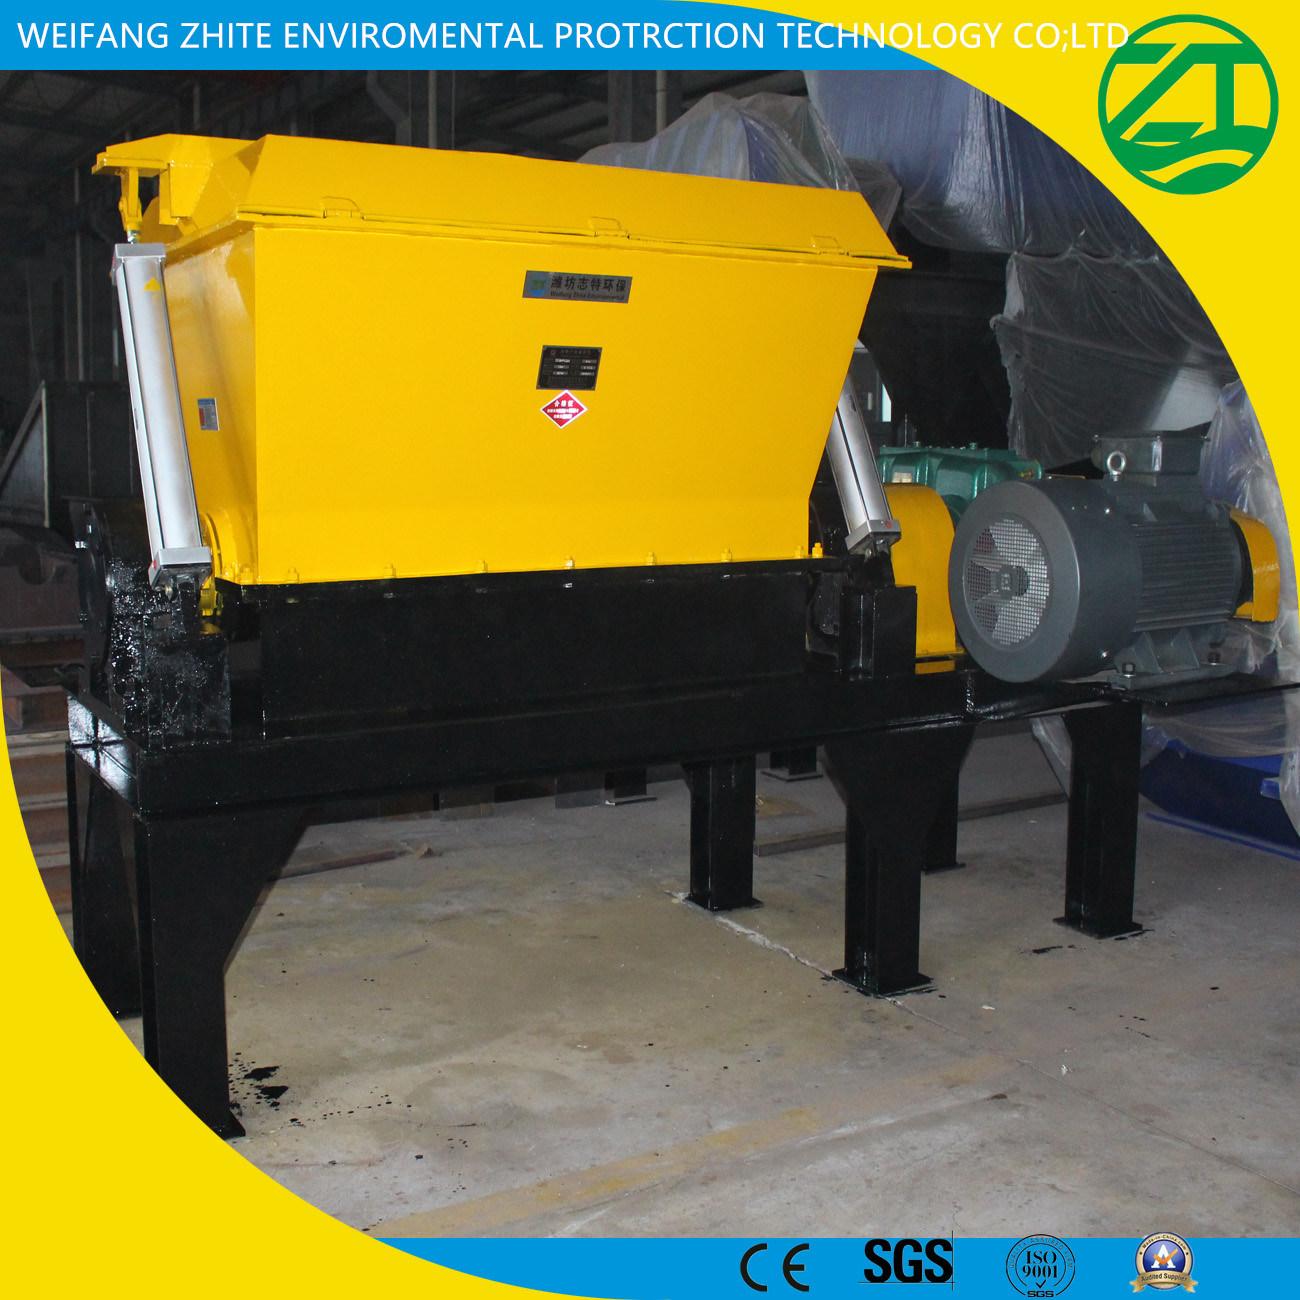 Efficient Two-Stage Shredder for Dead Pig/Cow/Chicken/Duck/Sheep/Horse/Municipal Waste/Foam